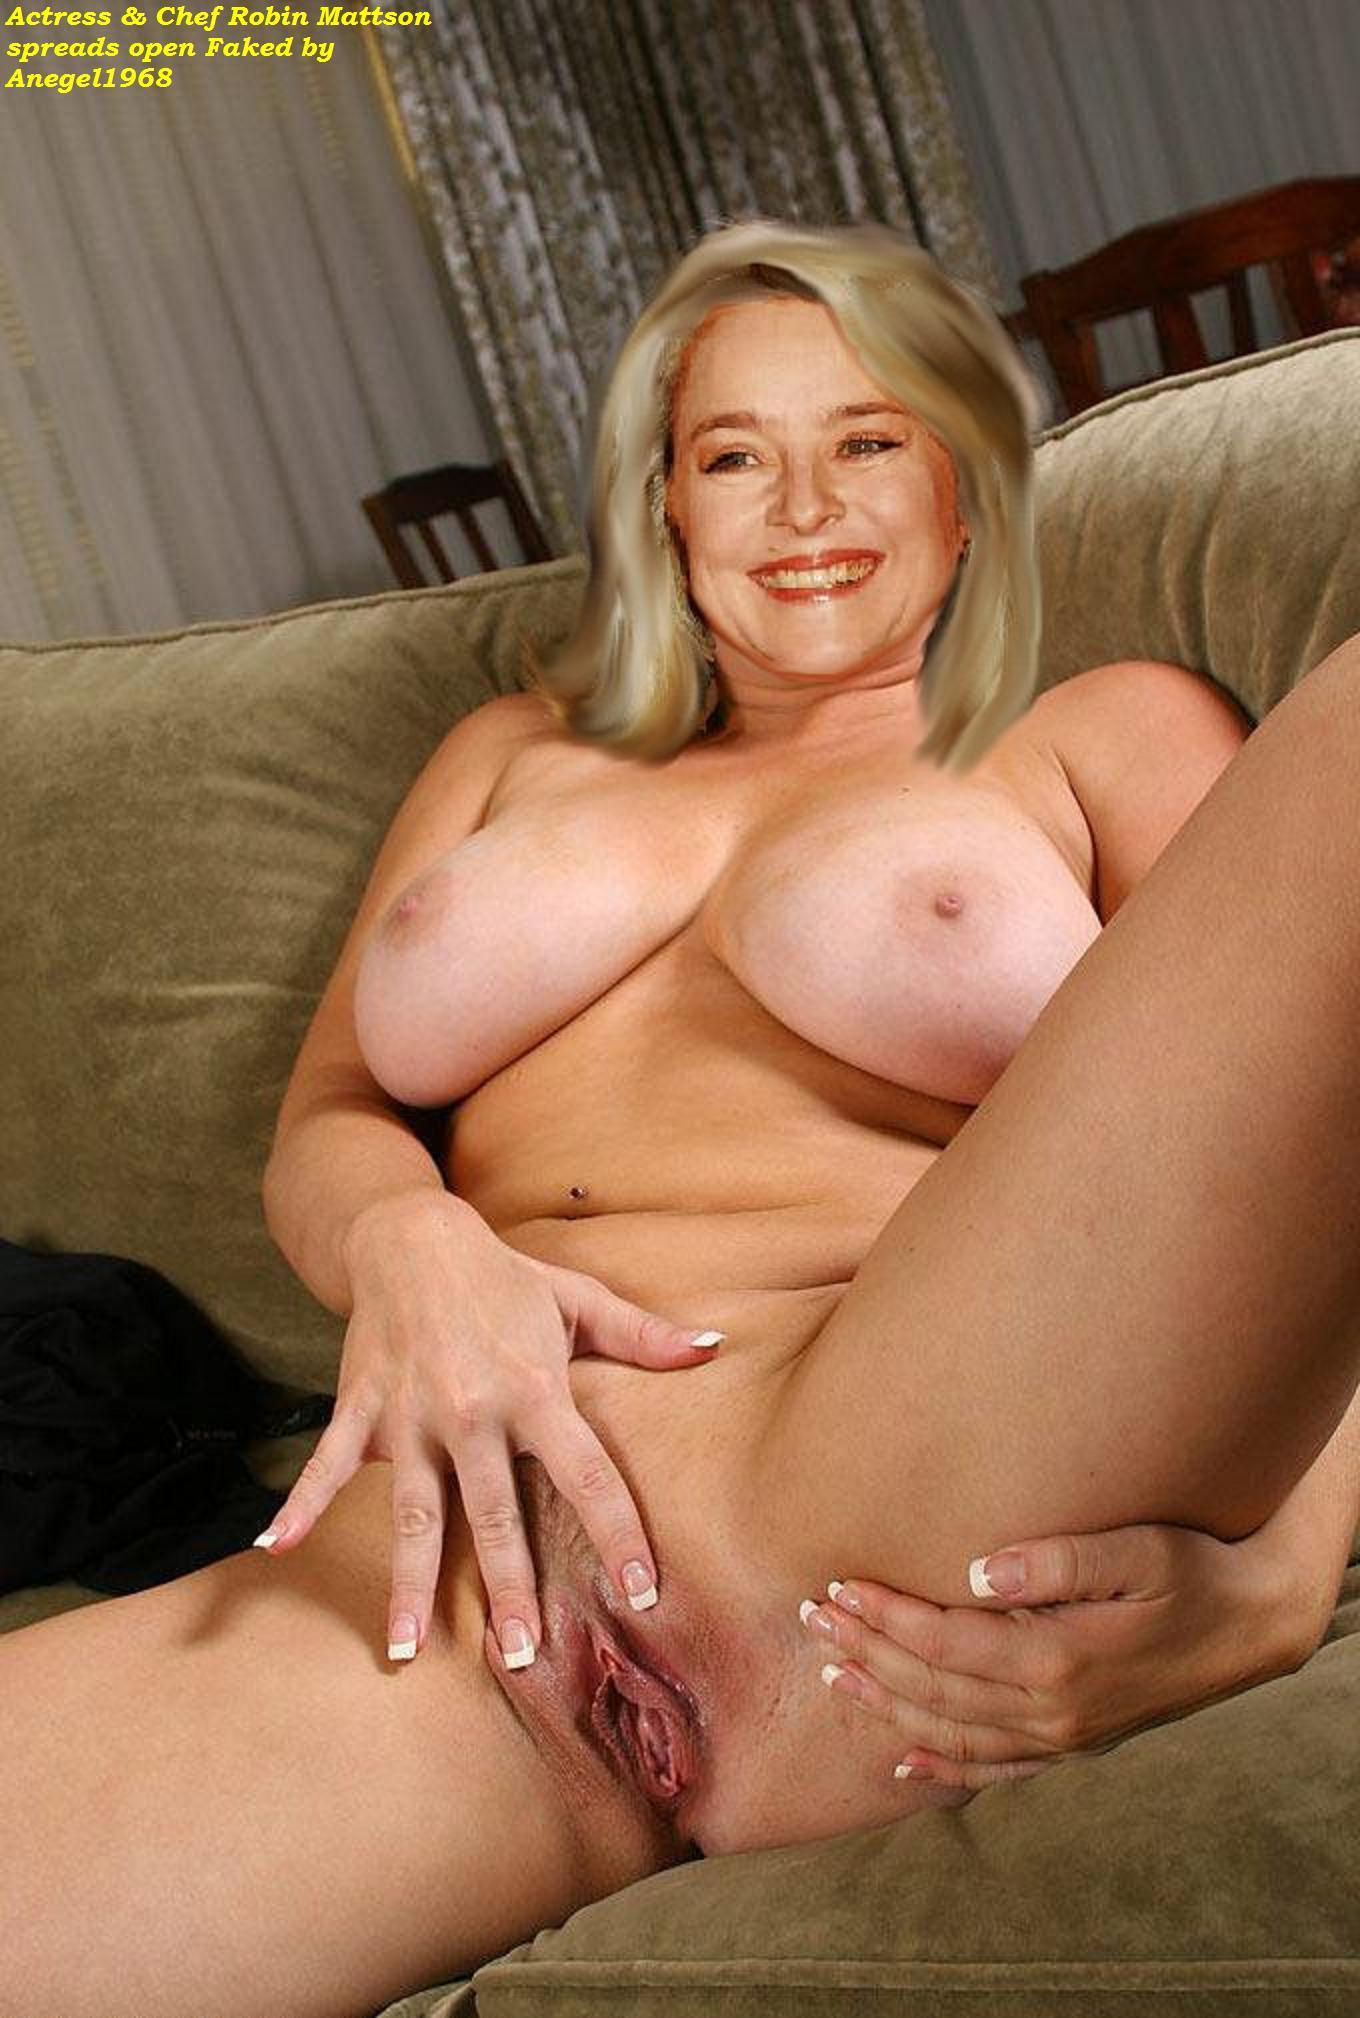 from Roy soap opera women naked